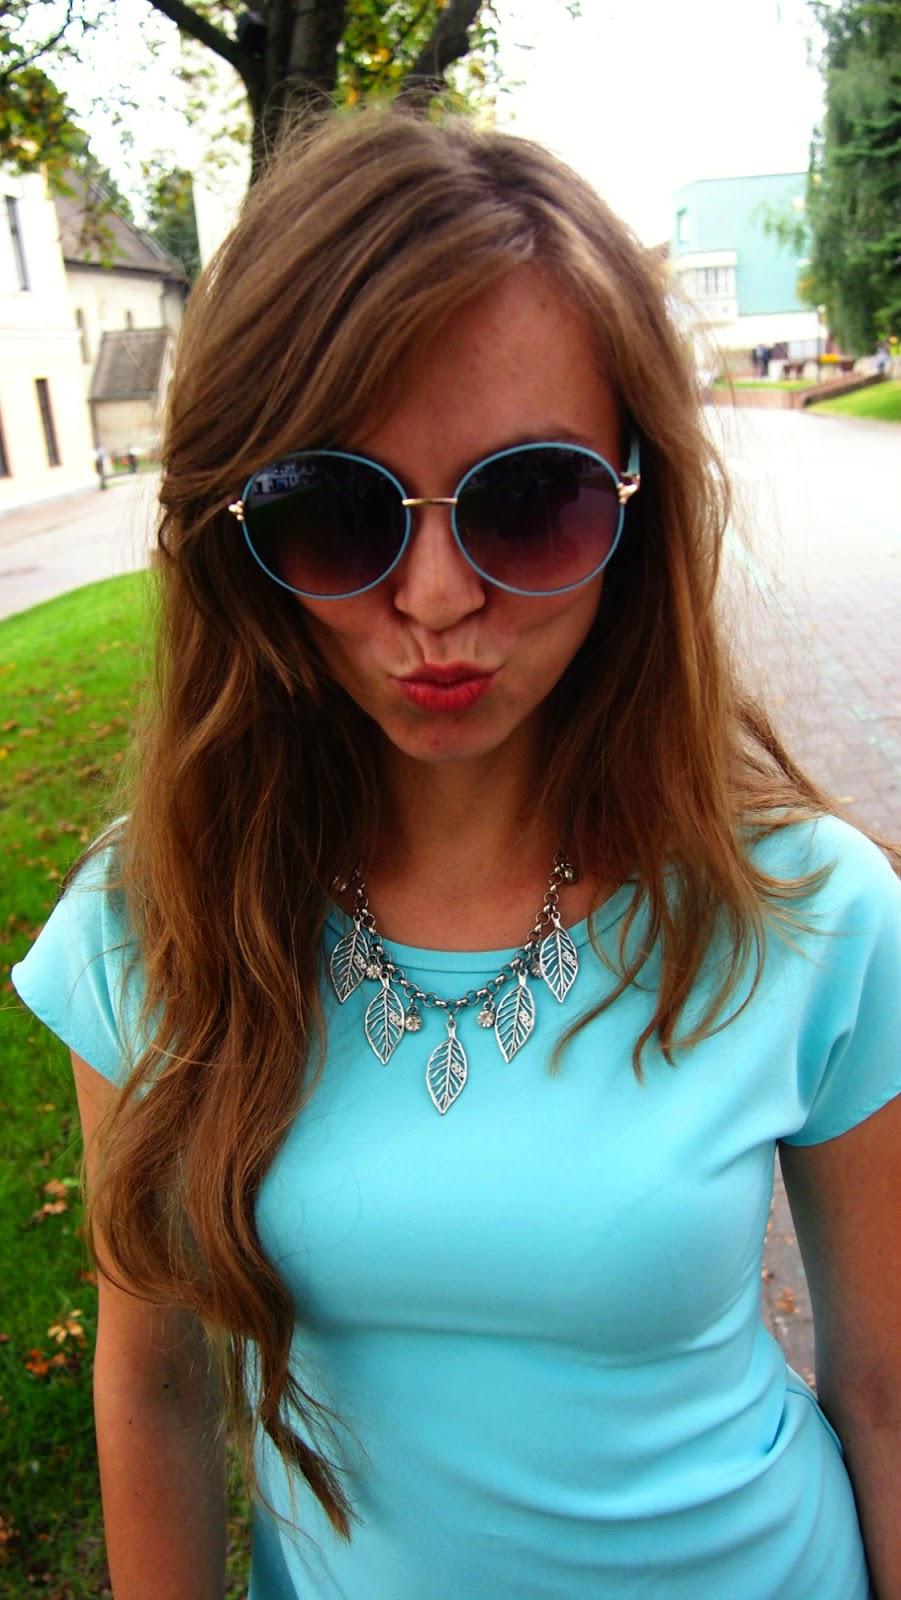 modré slnečné okuliare